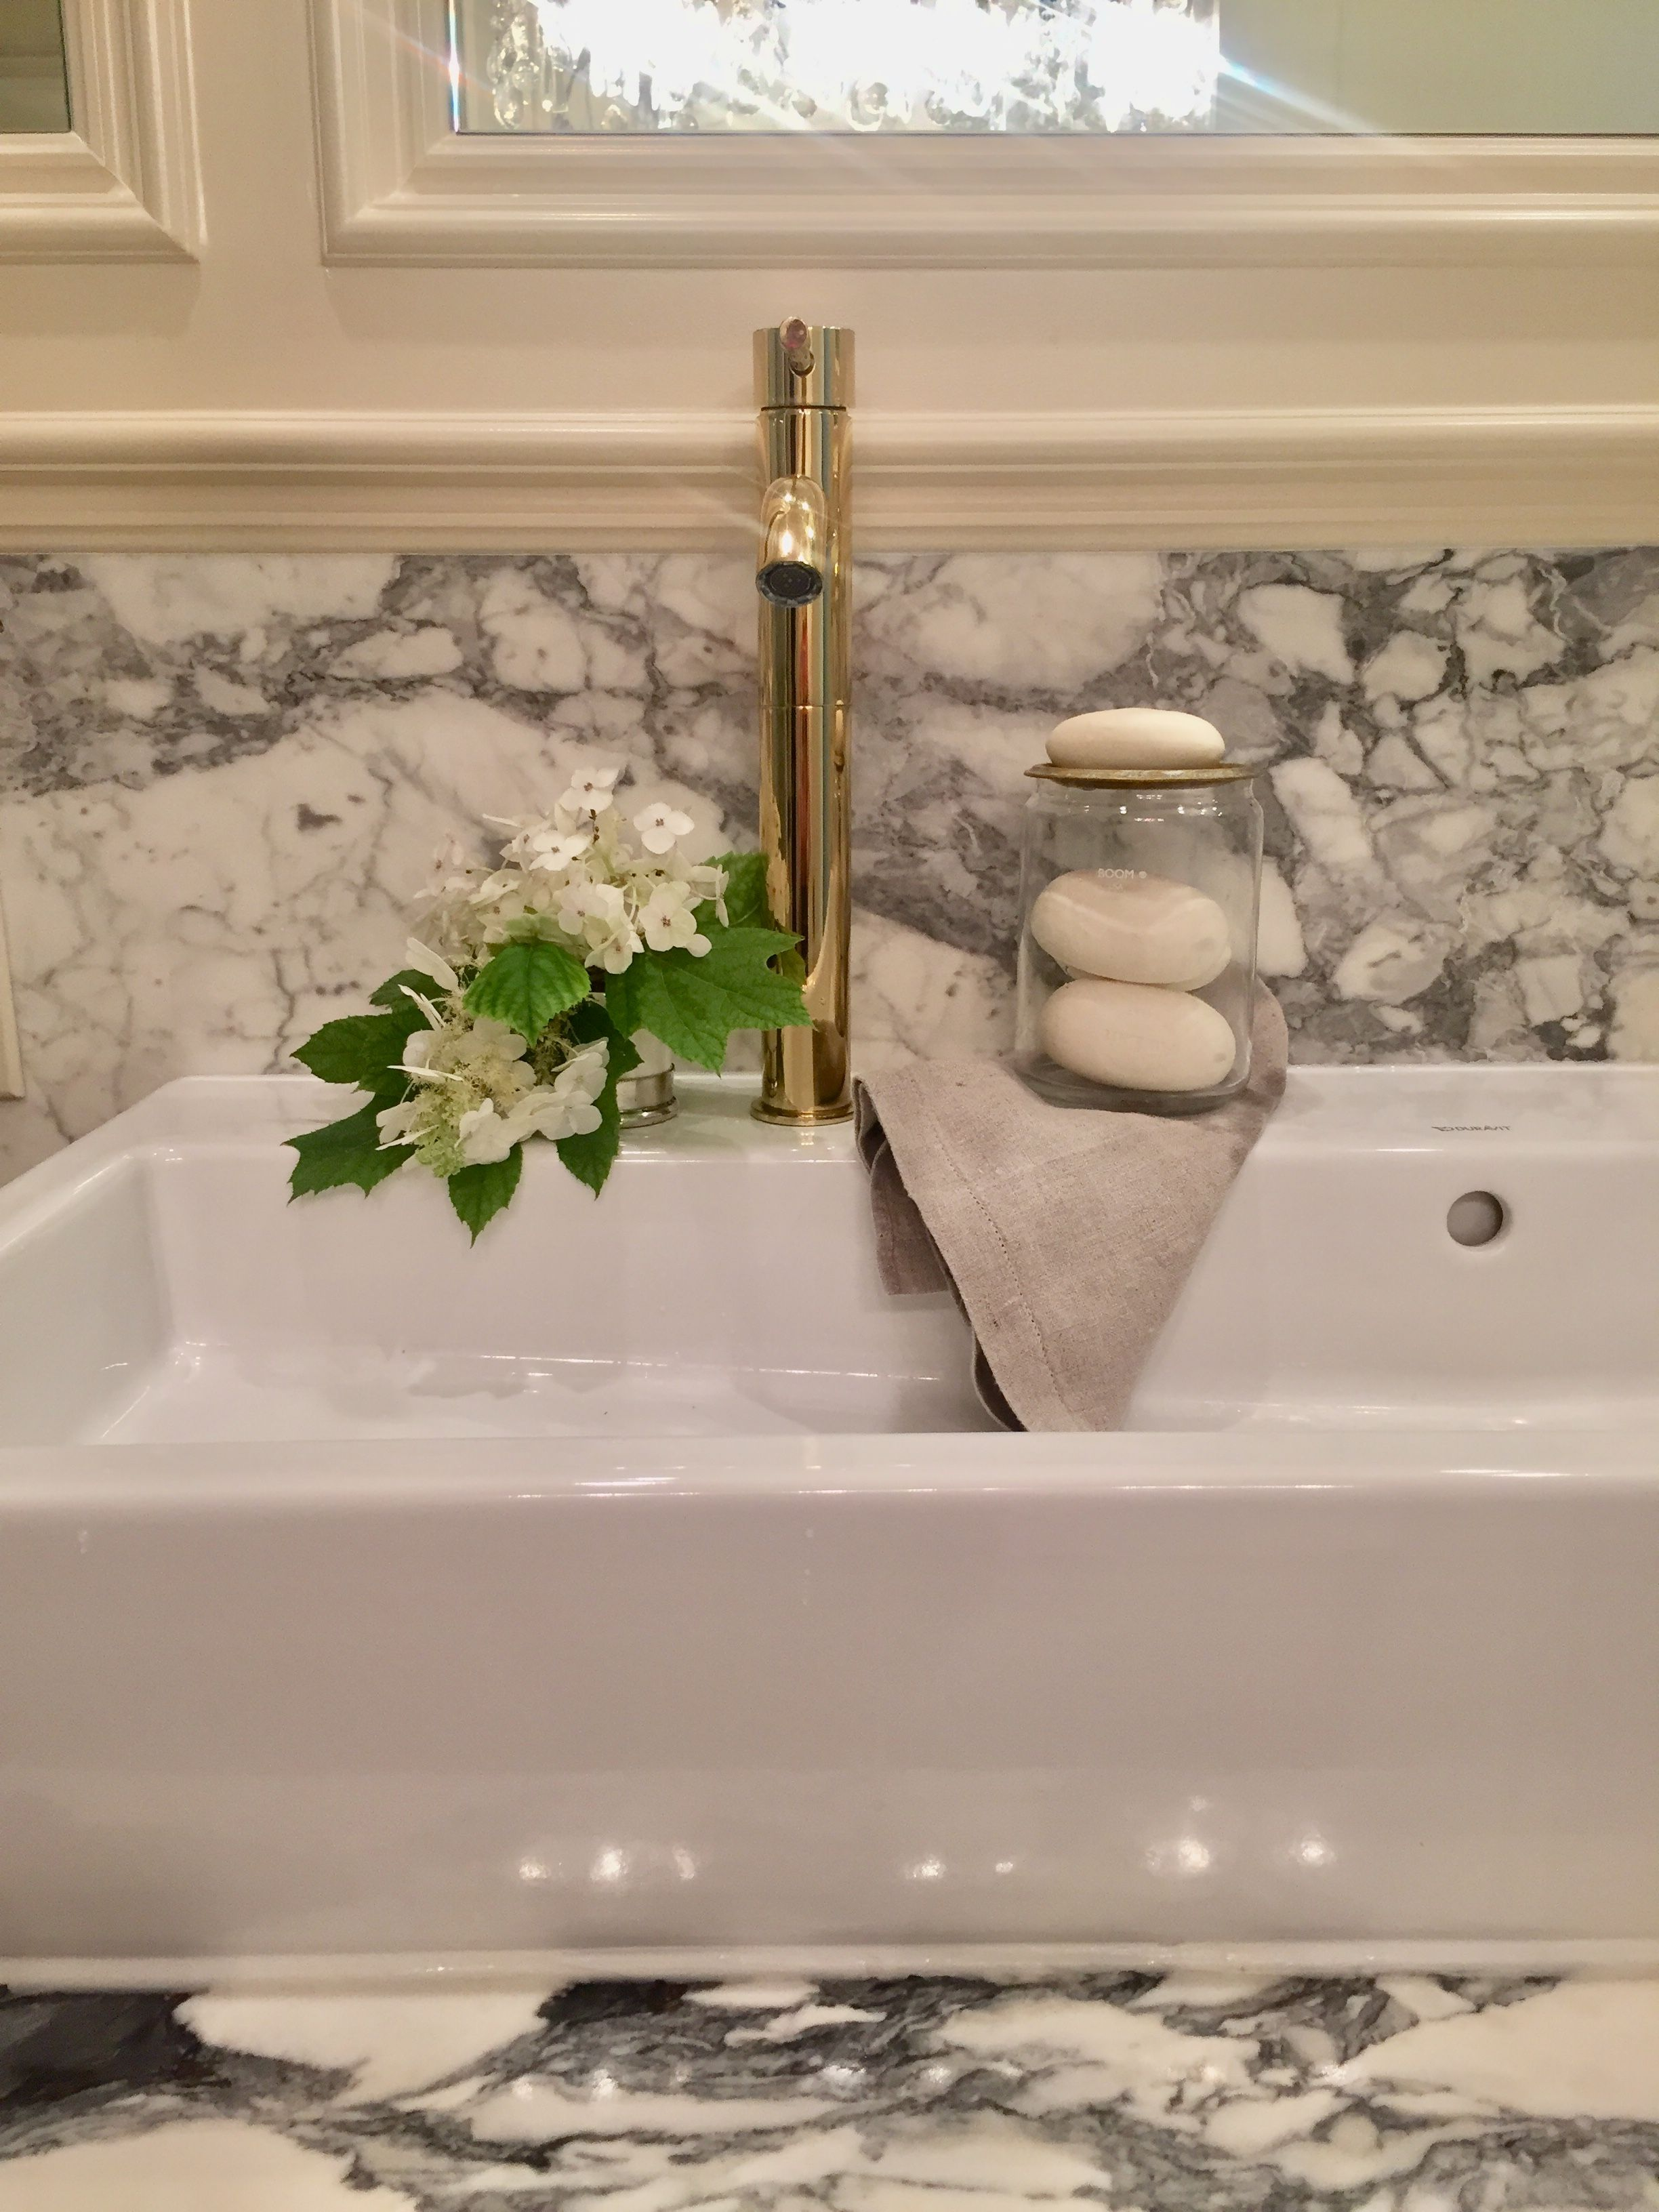 Statuario Marble Slab Backsplash Ligne Crystal Chandelier, Freestanding  Modern Duravit Double Sink And Oversized,